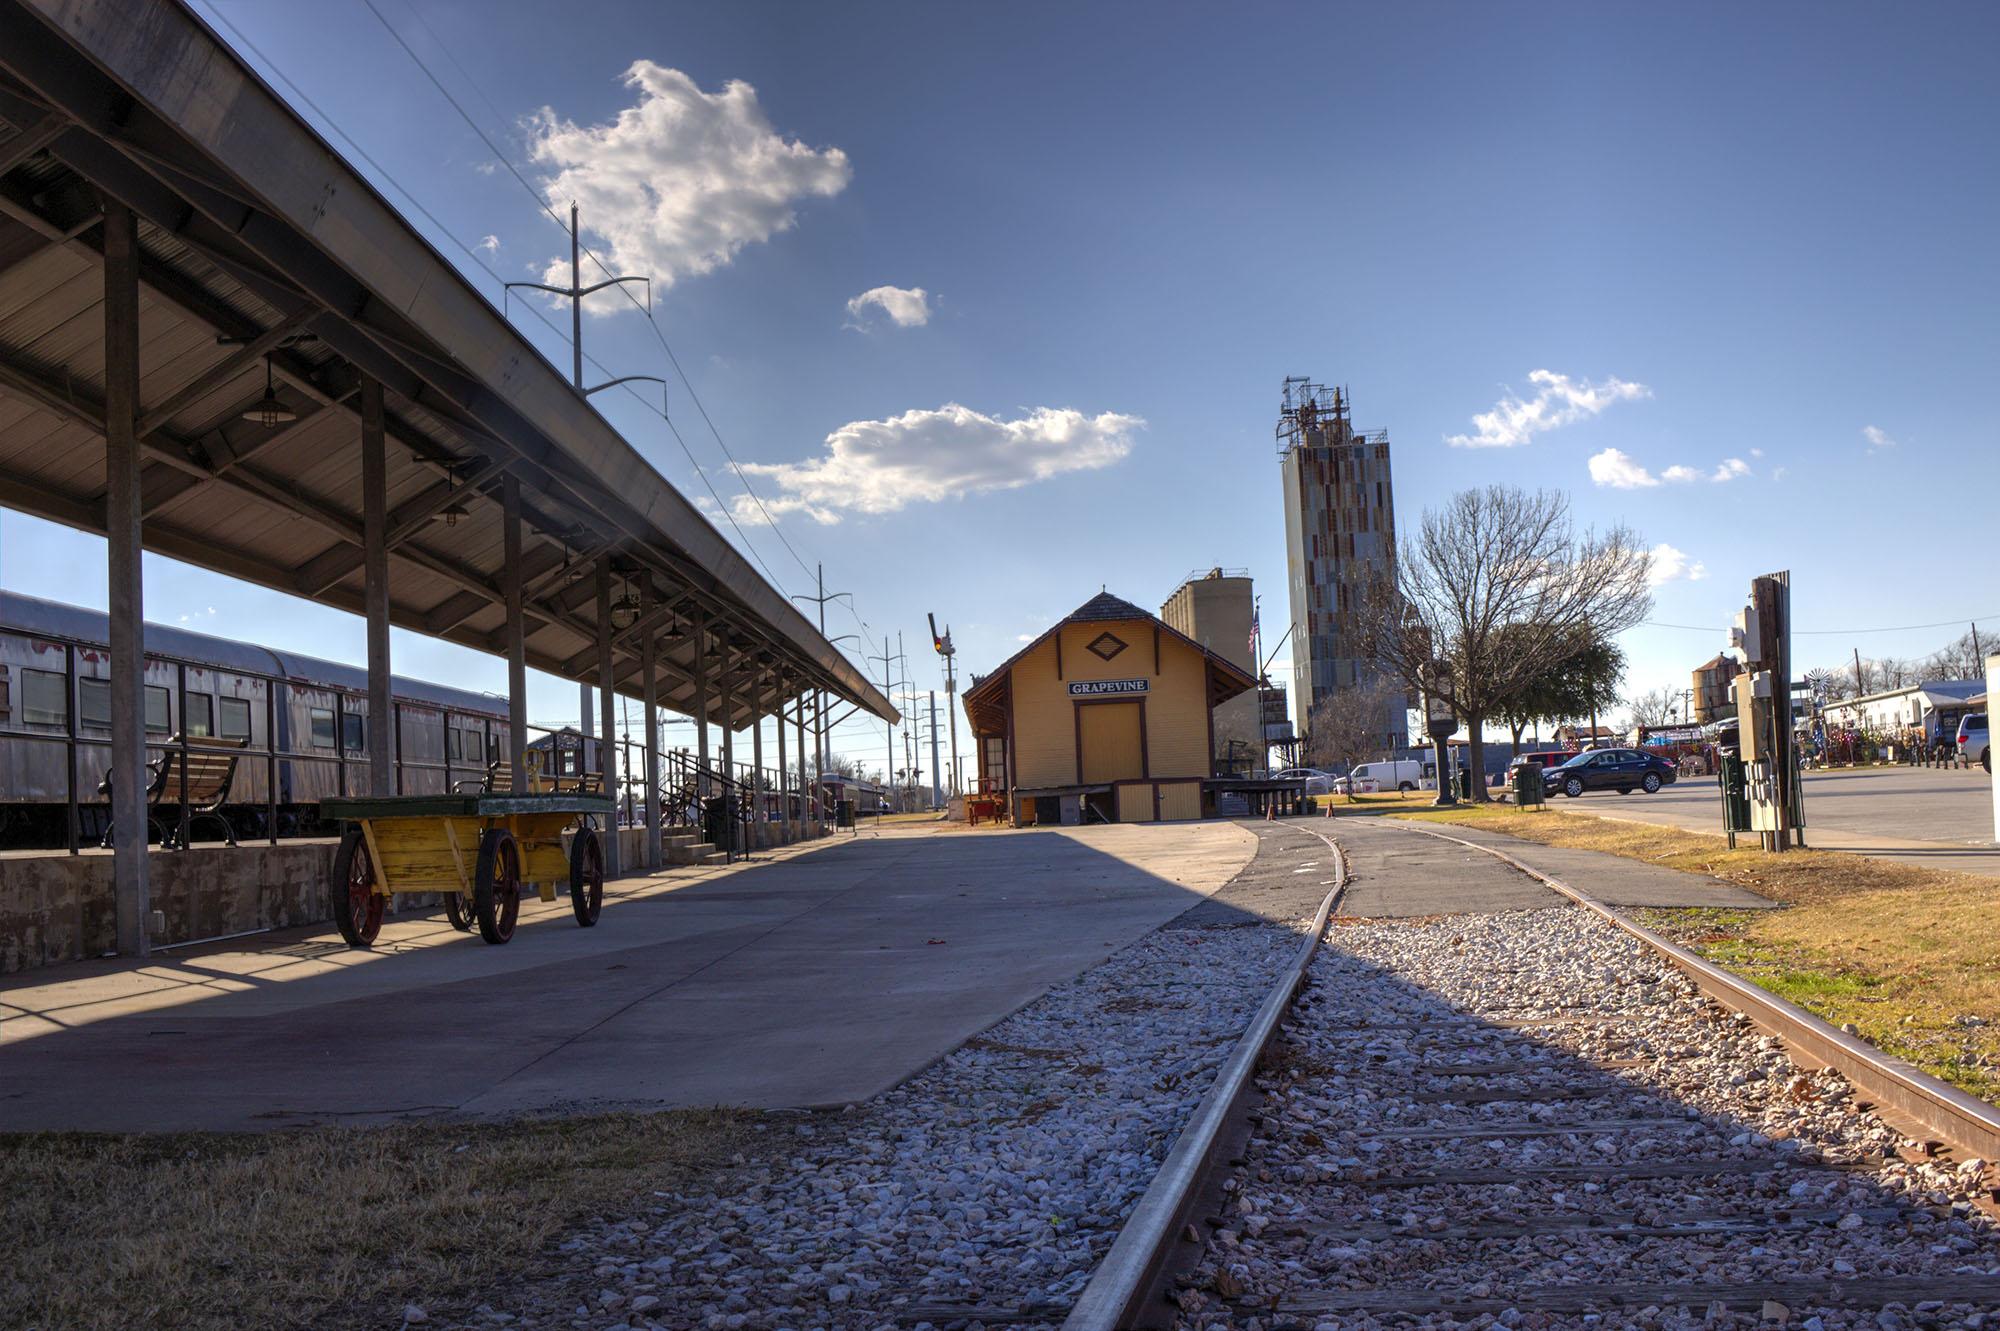 Blue Skies Above the Grapevine Vintage Railroad